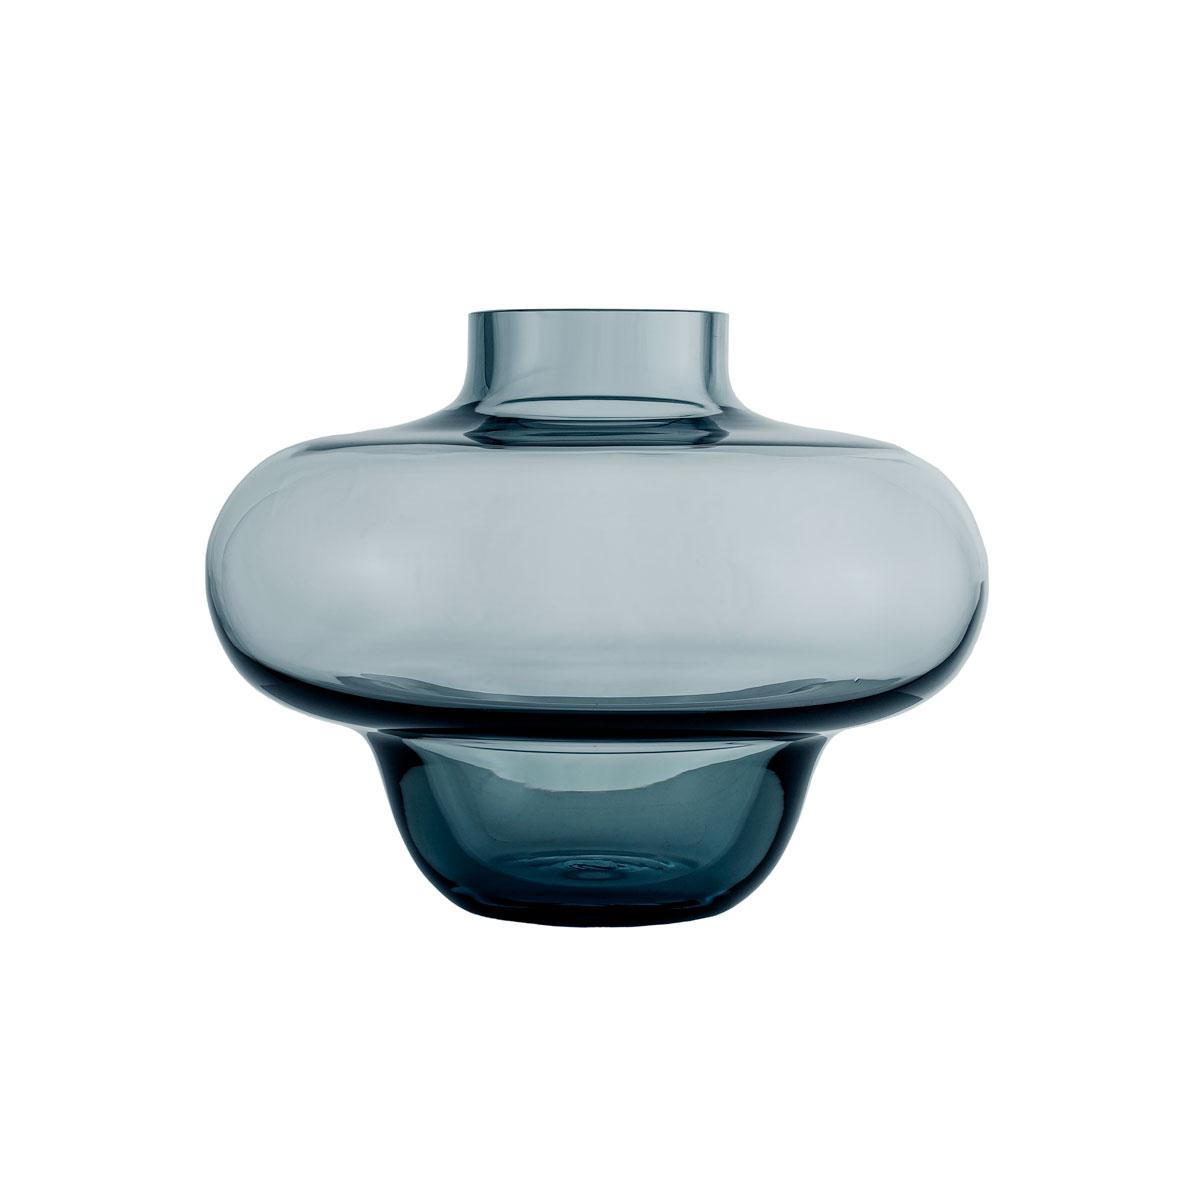 "Kosta Boda Kappa 6"" Vase Small"